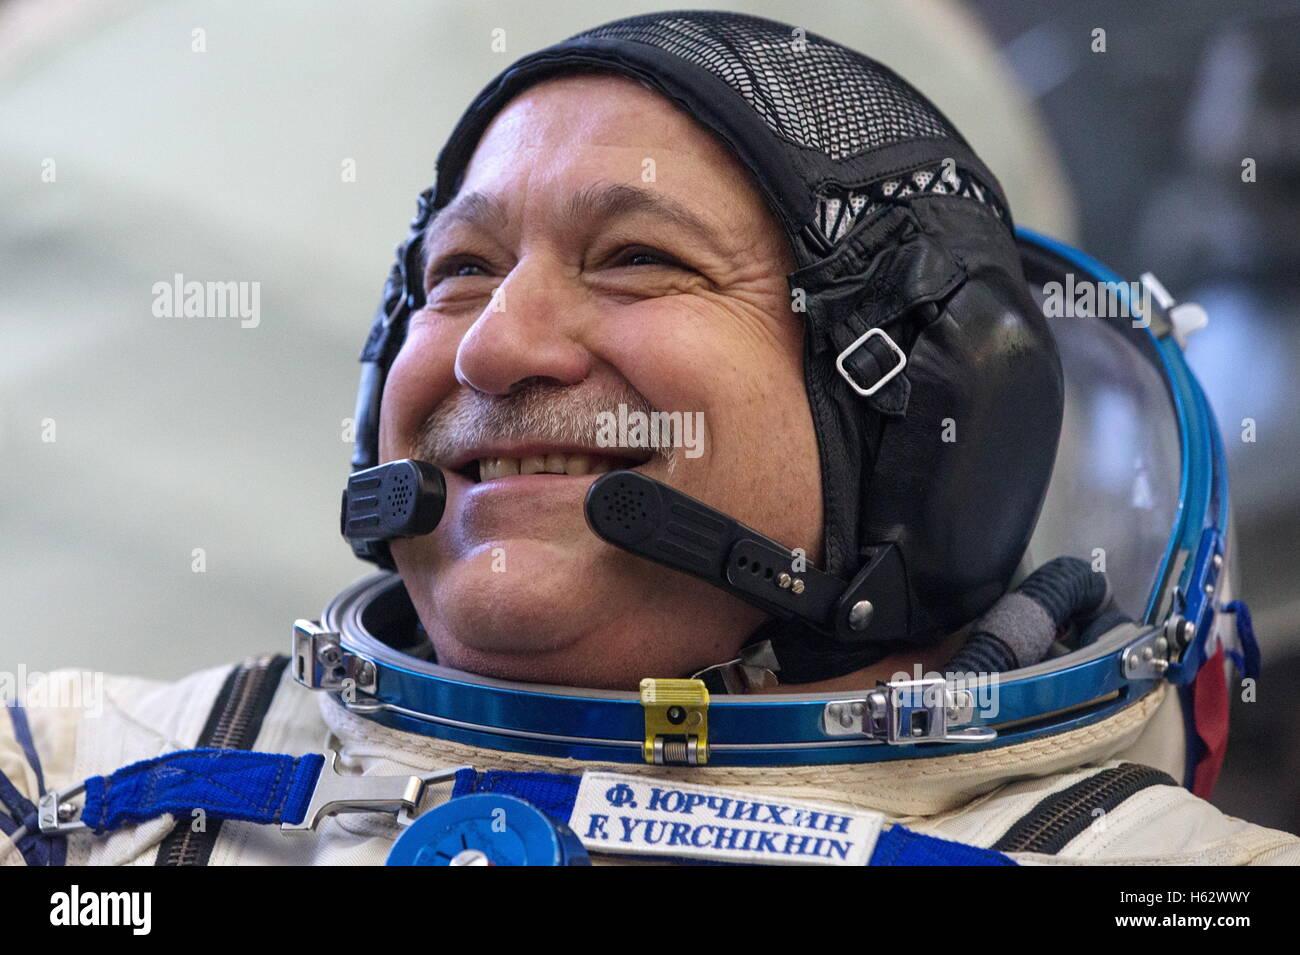 Moscow Region, Russia. 24th Oct, 2016. ISS Expedition 49/50 backup crew member, cosmonaut Fyodor Yurchikhin (Roscosmos) - Stock Image